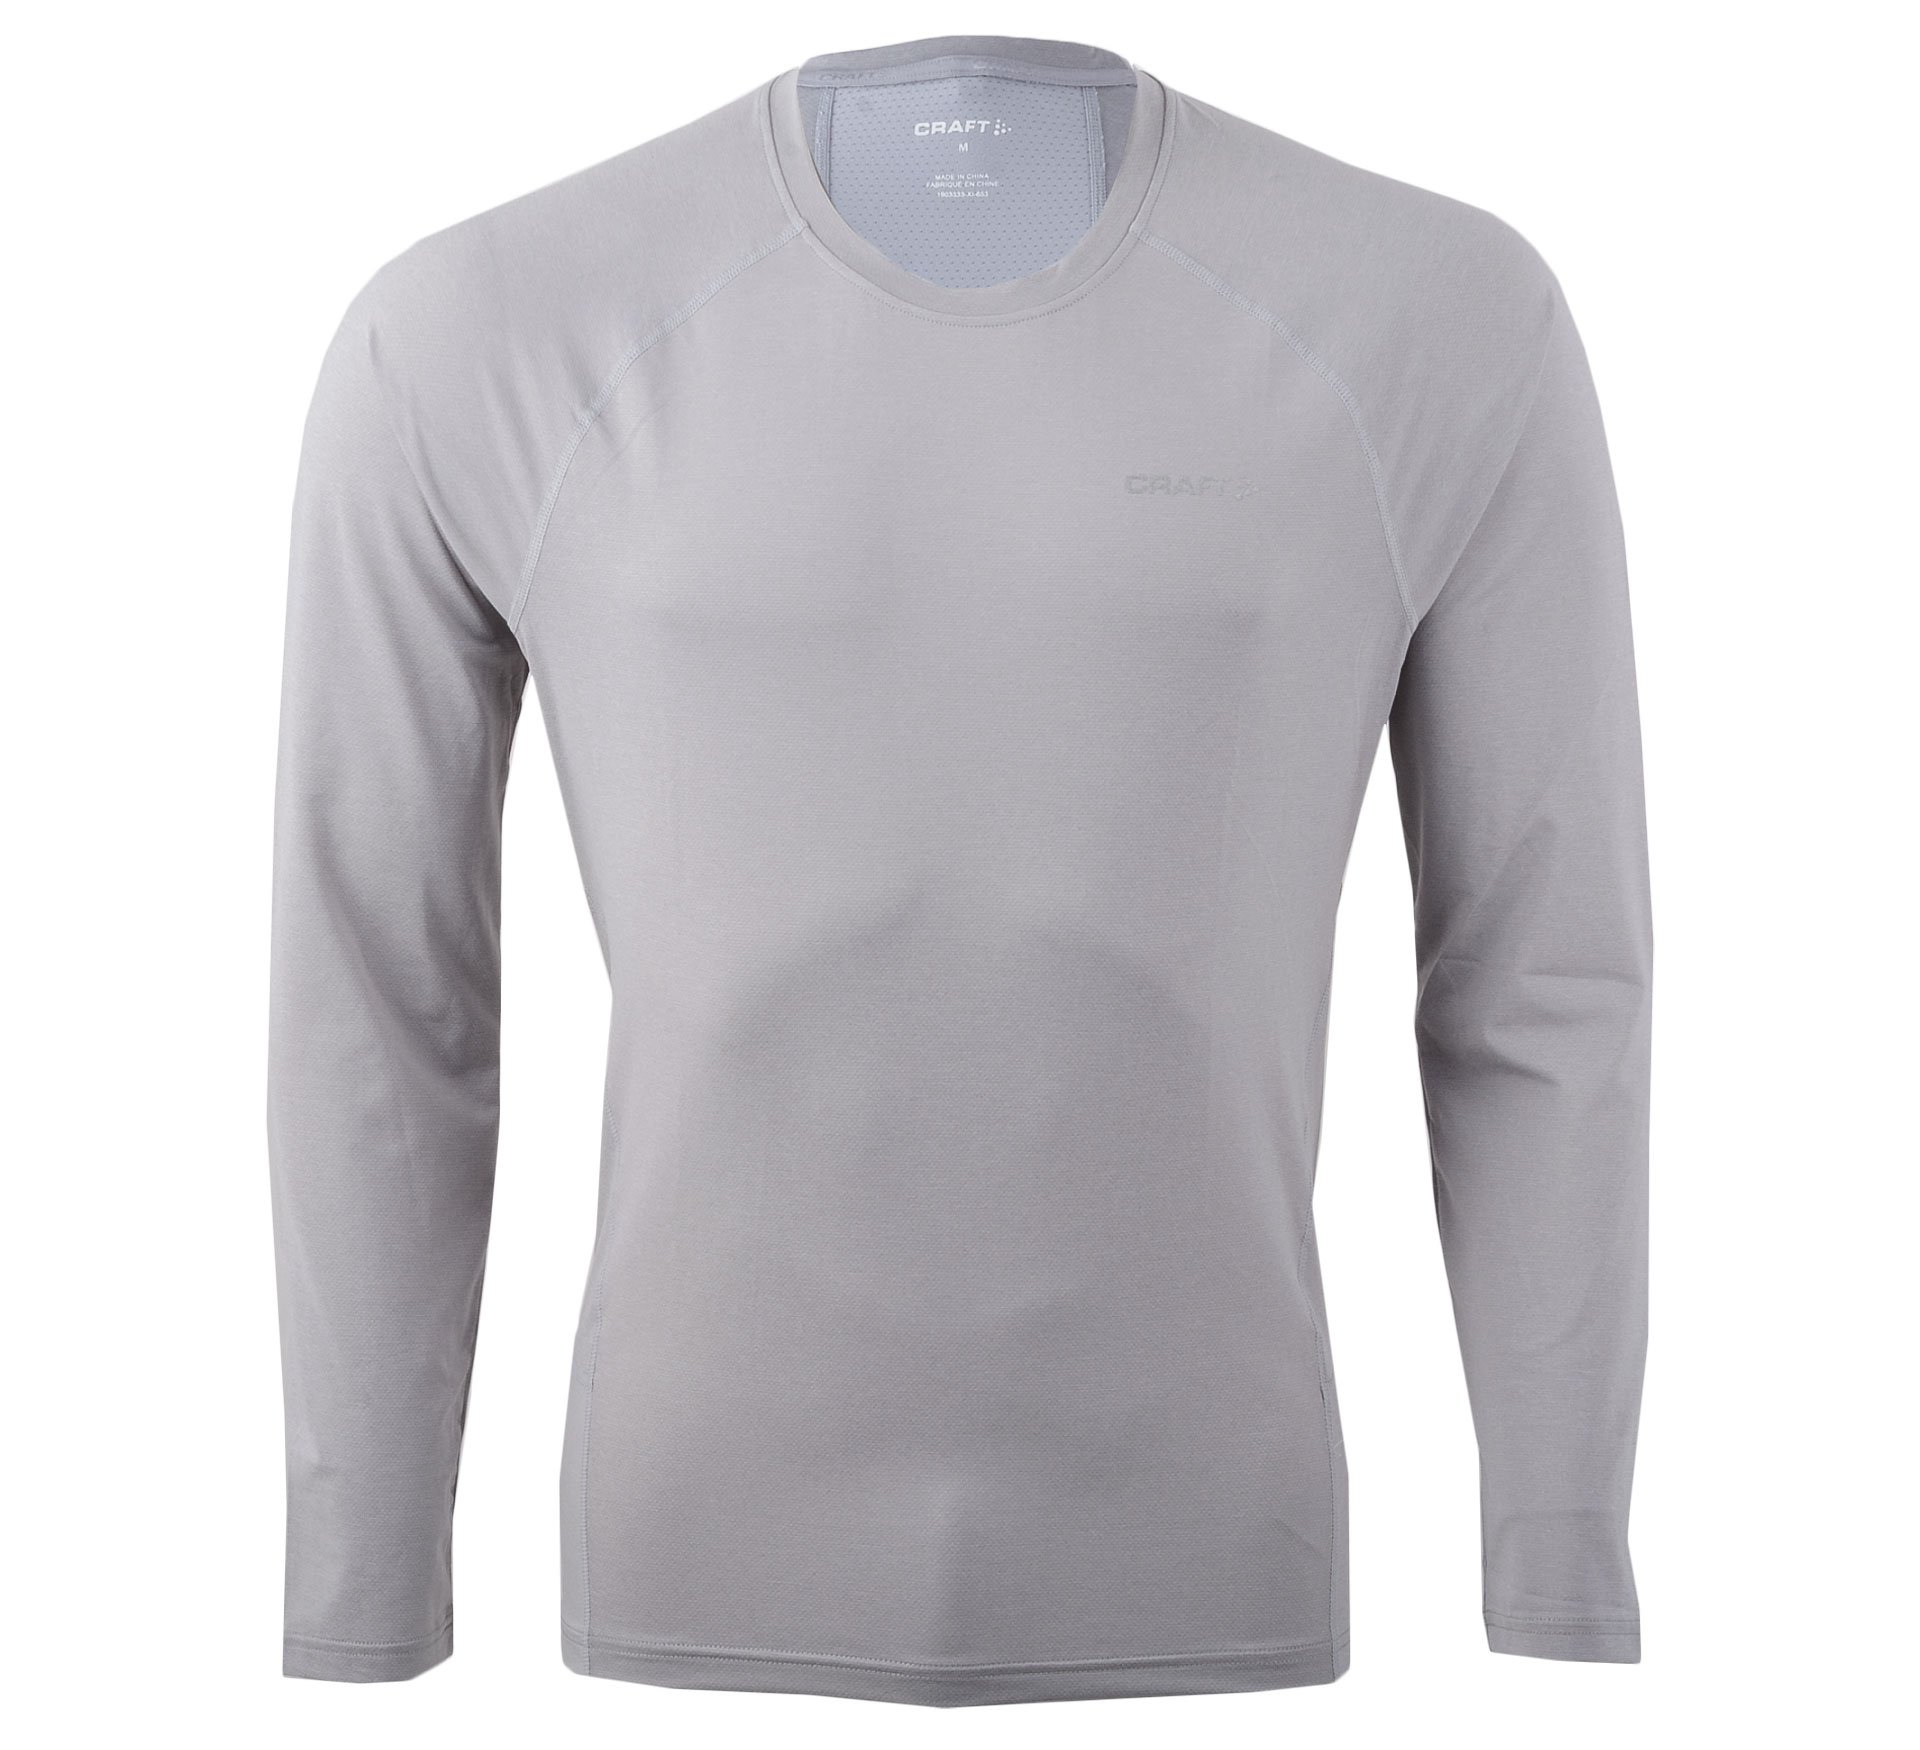 Craft Percise Long Sleeve grijs